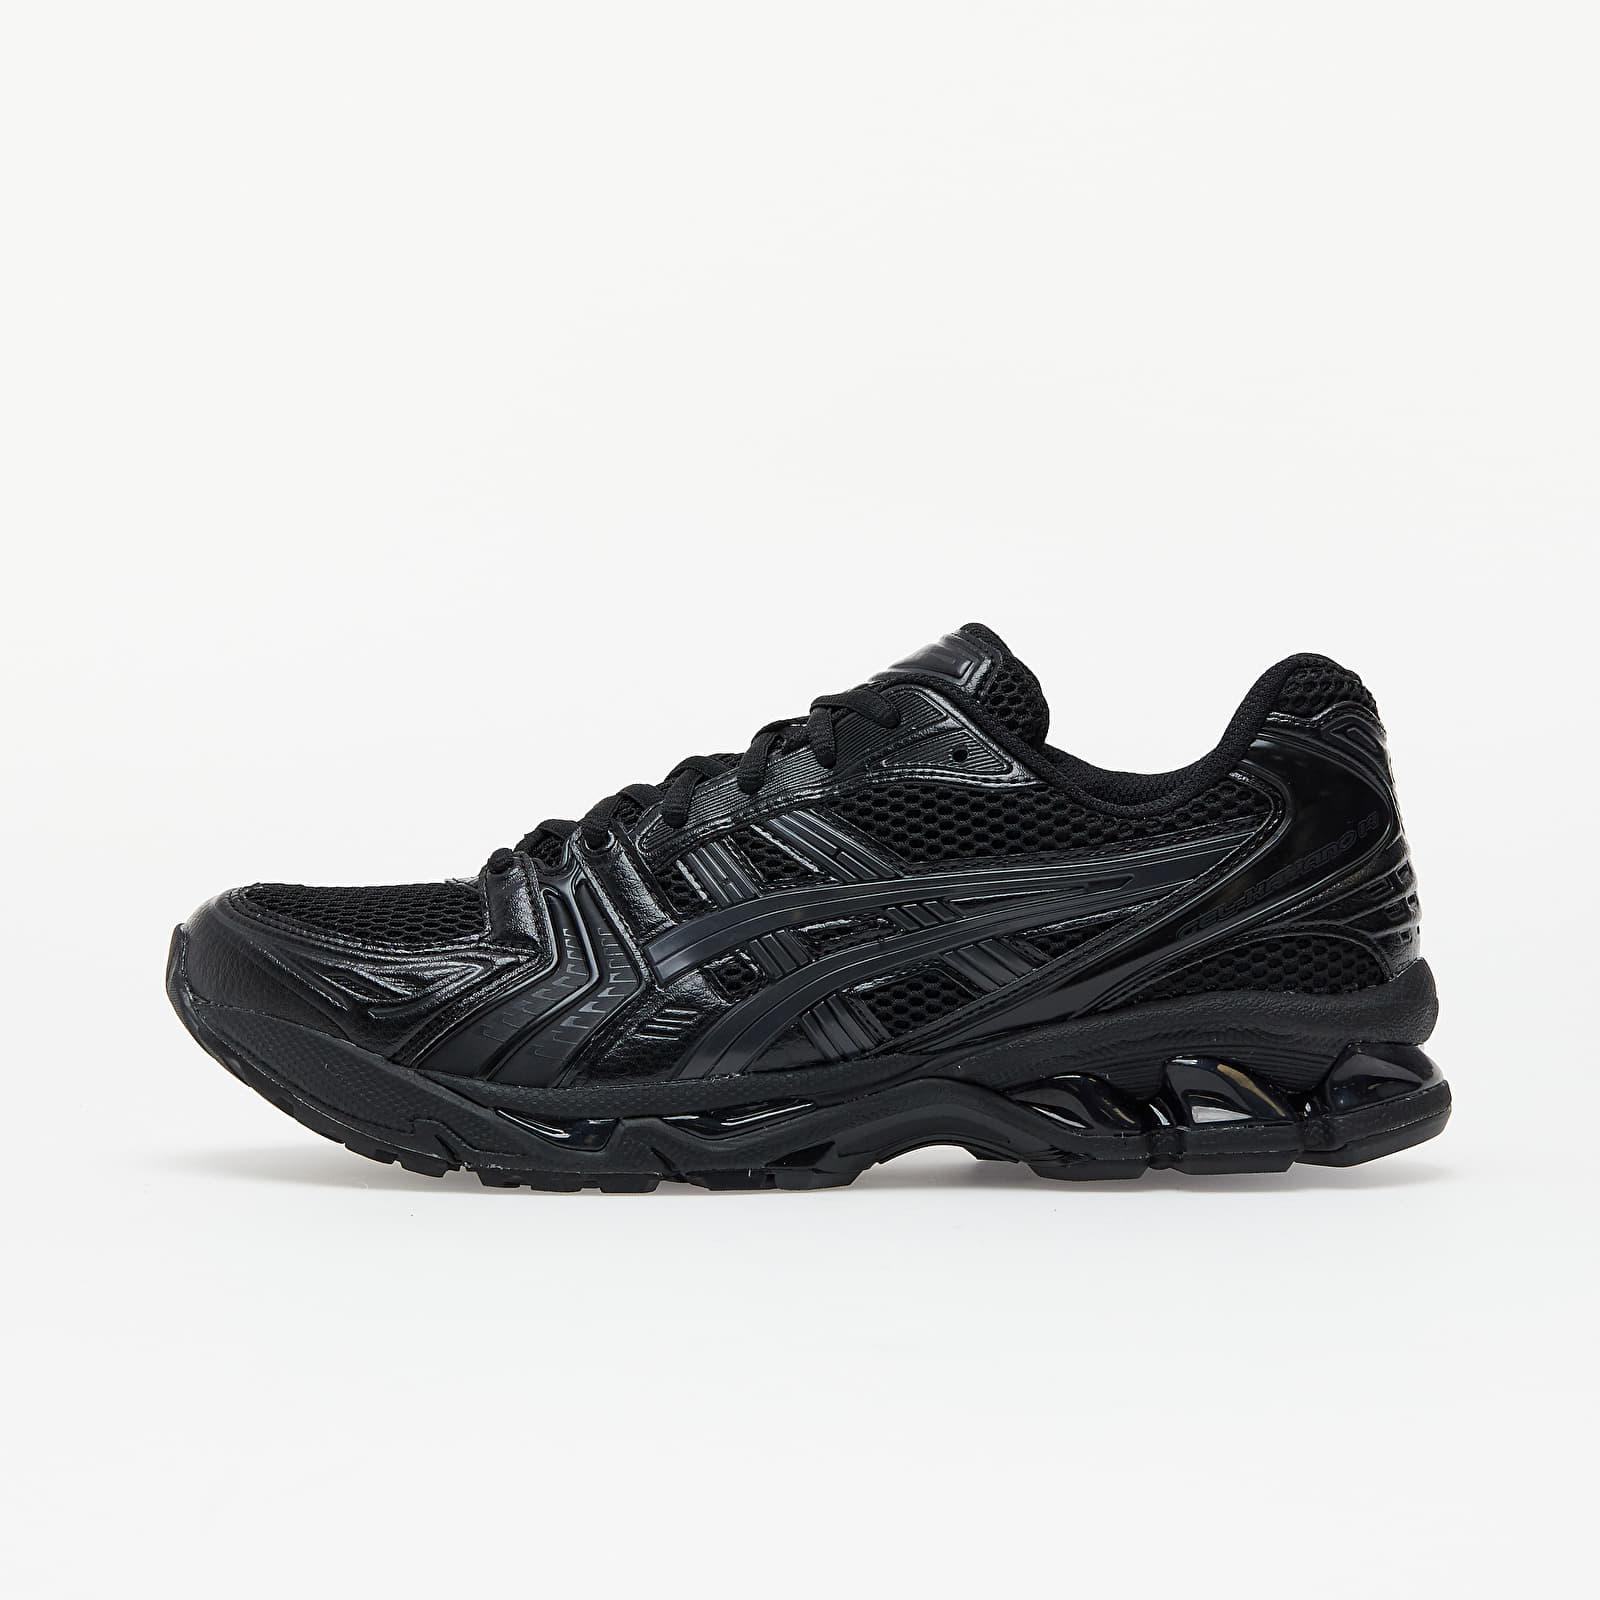 Asics Gel-Kayano 14 Black/ Graphite Grey | Footshop